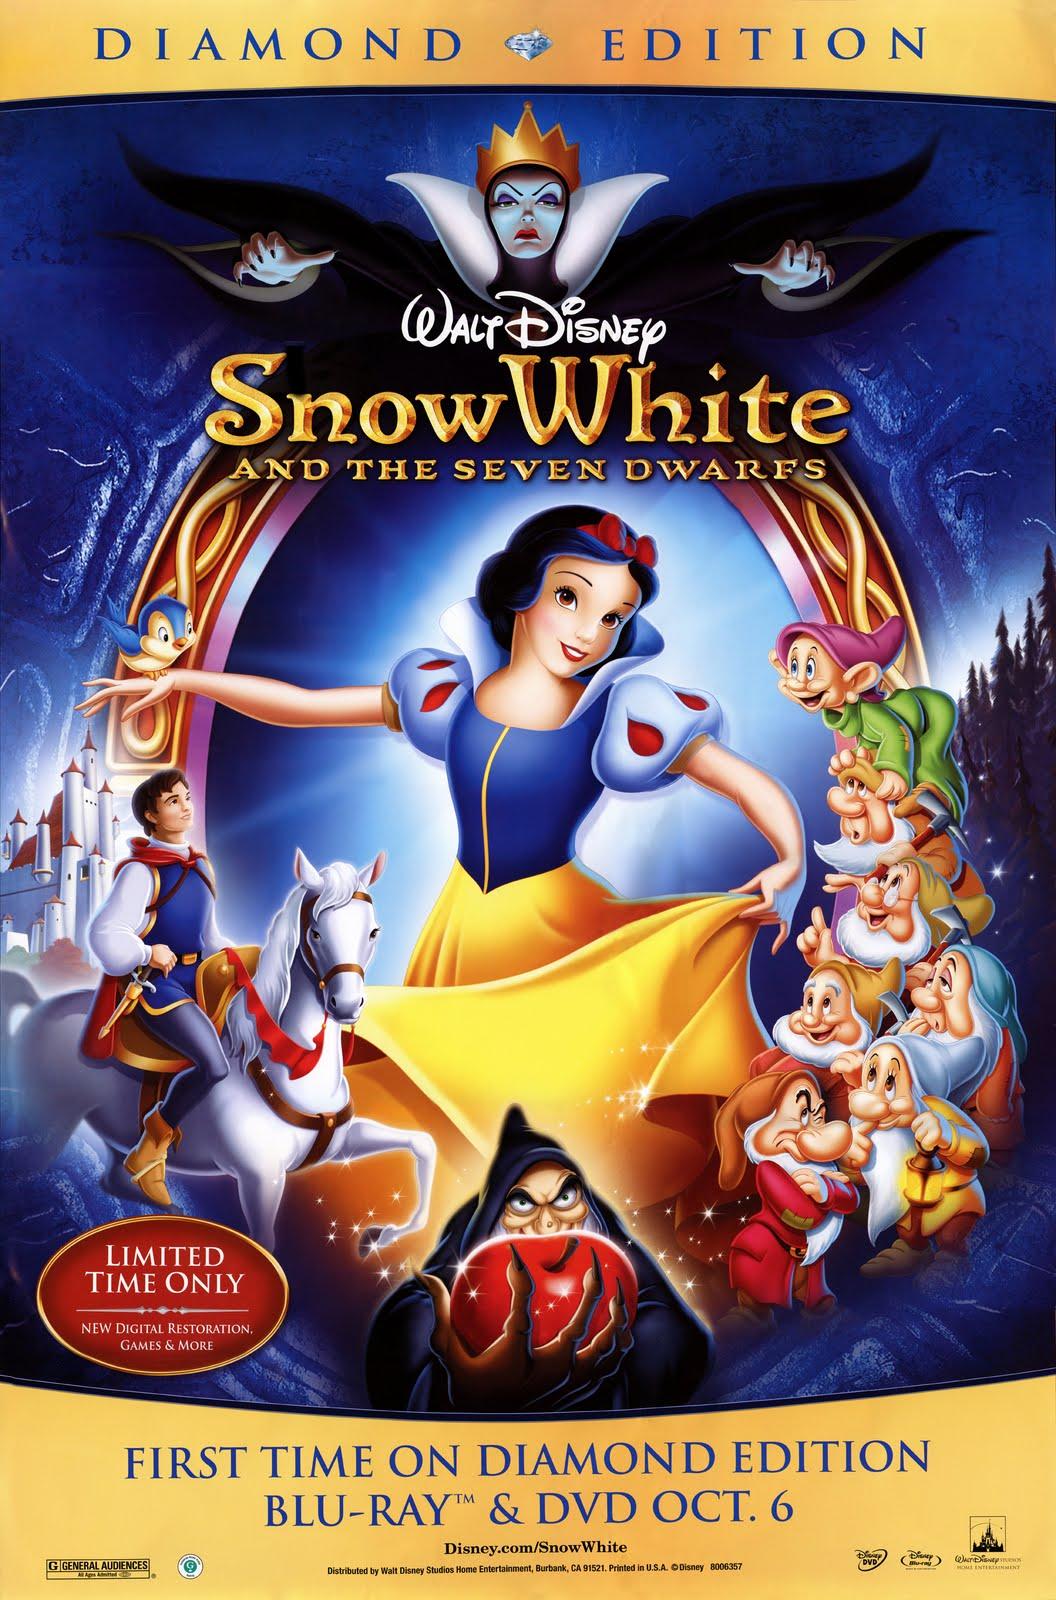 Les affiches du film Snow+White+%2526+The+Seven+Dwarves+%25281937%2529+2009+DVD+Poster